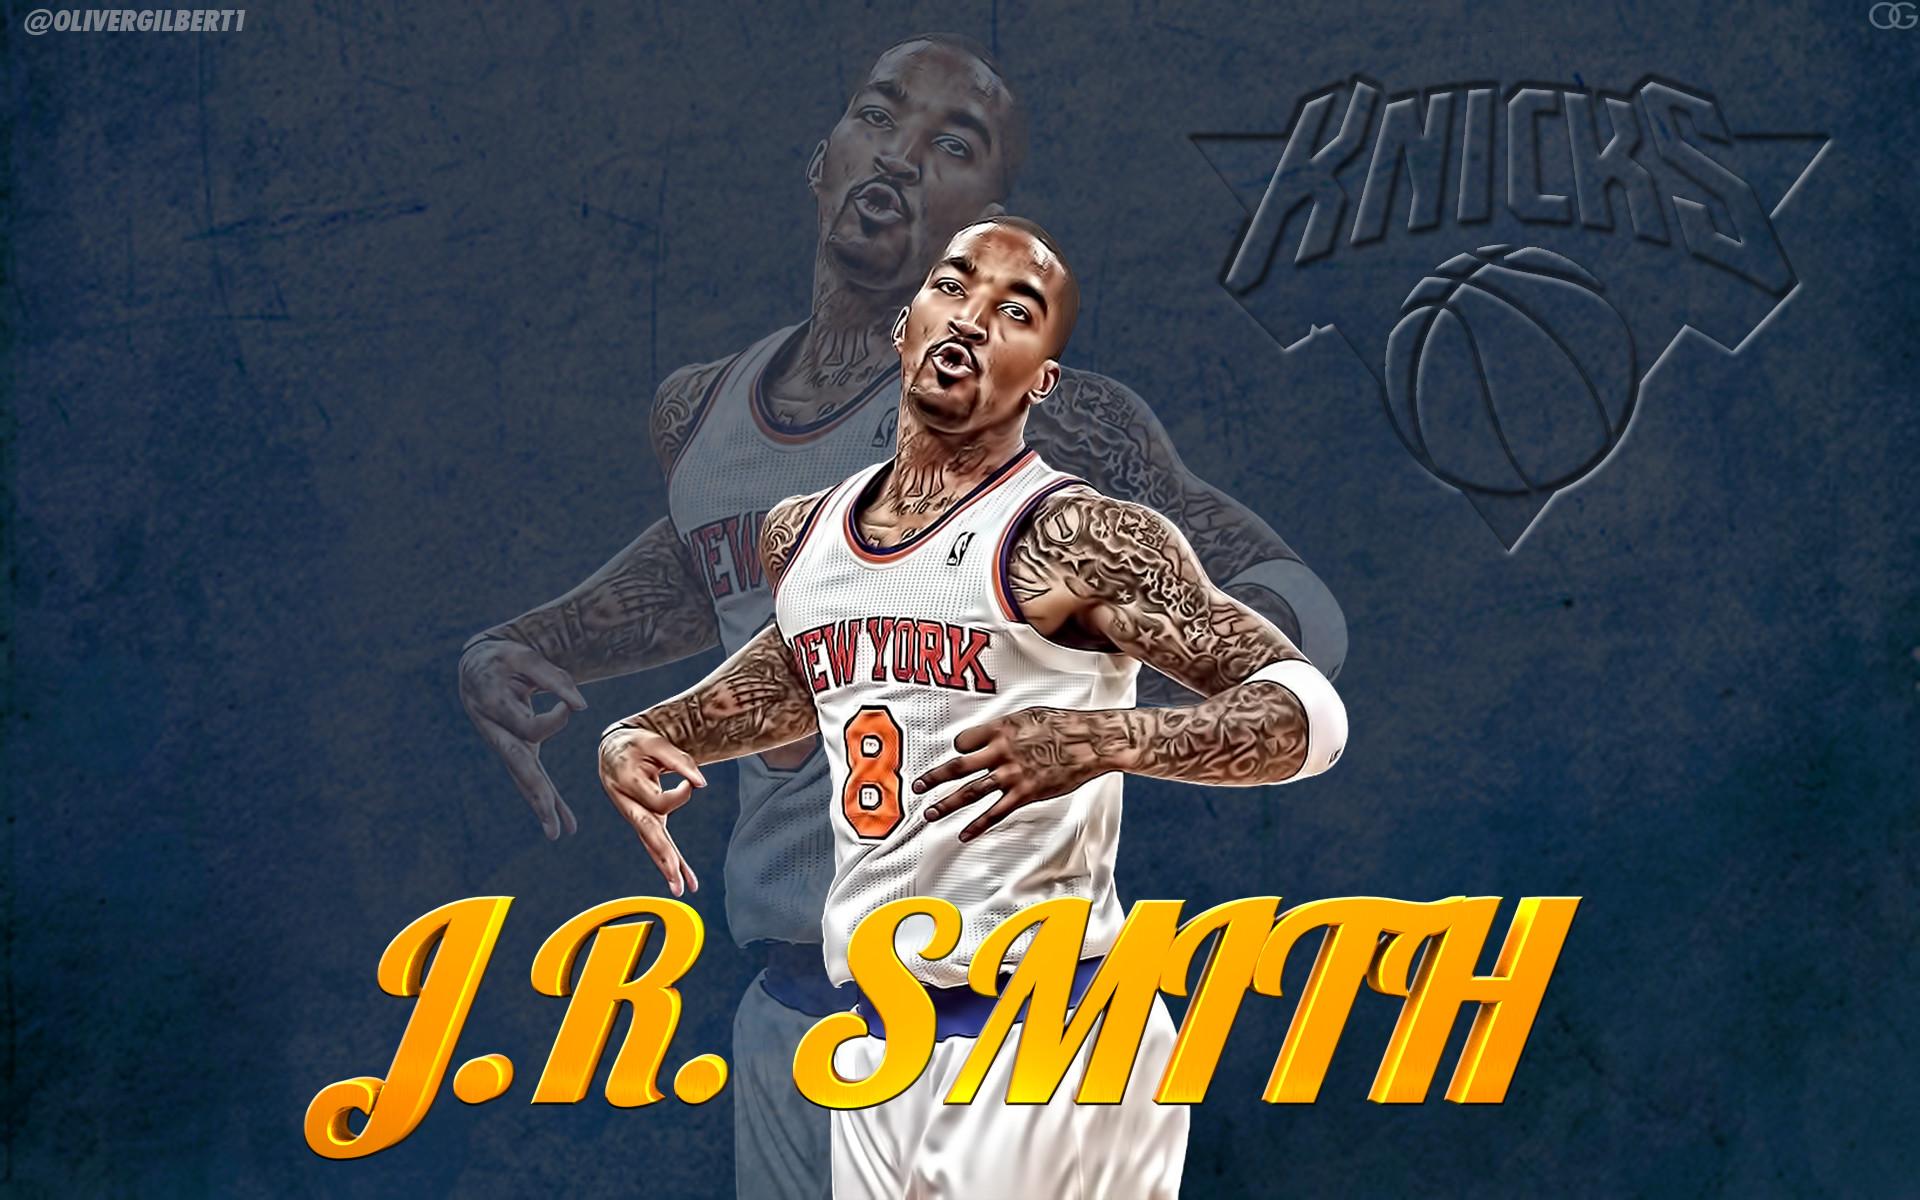 Res: 1920x1200, J.R. Smith Knicks Wallpaper by Hecziaa J.R. Smith Knicks Wallpaper by  Hecziaa